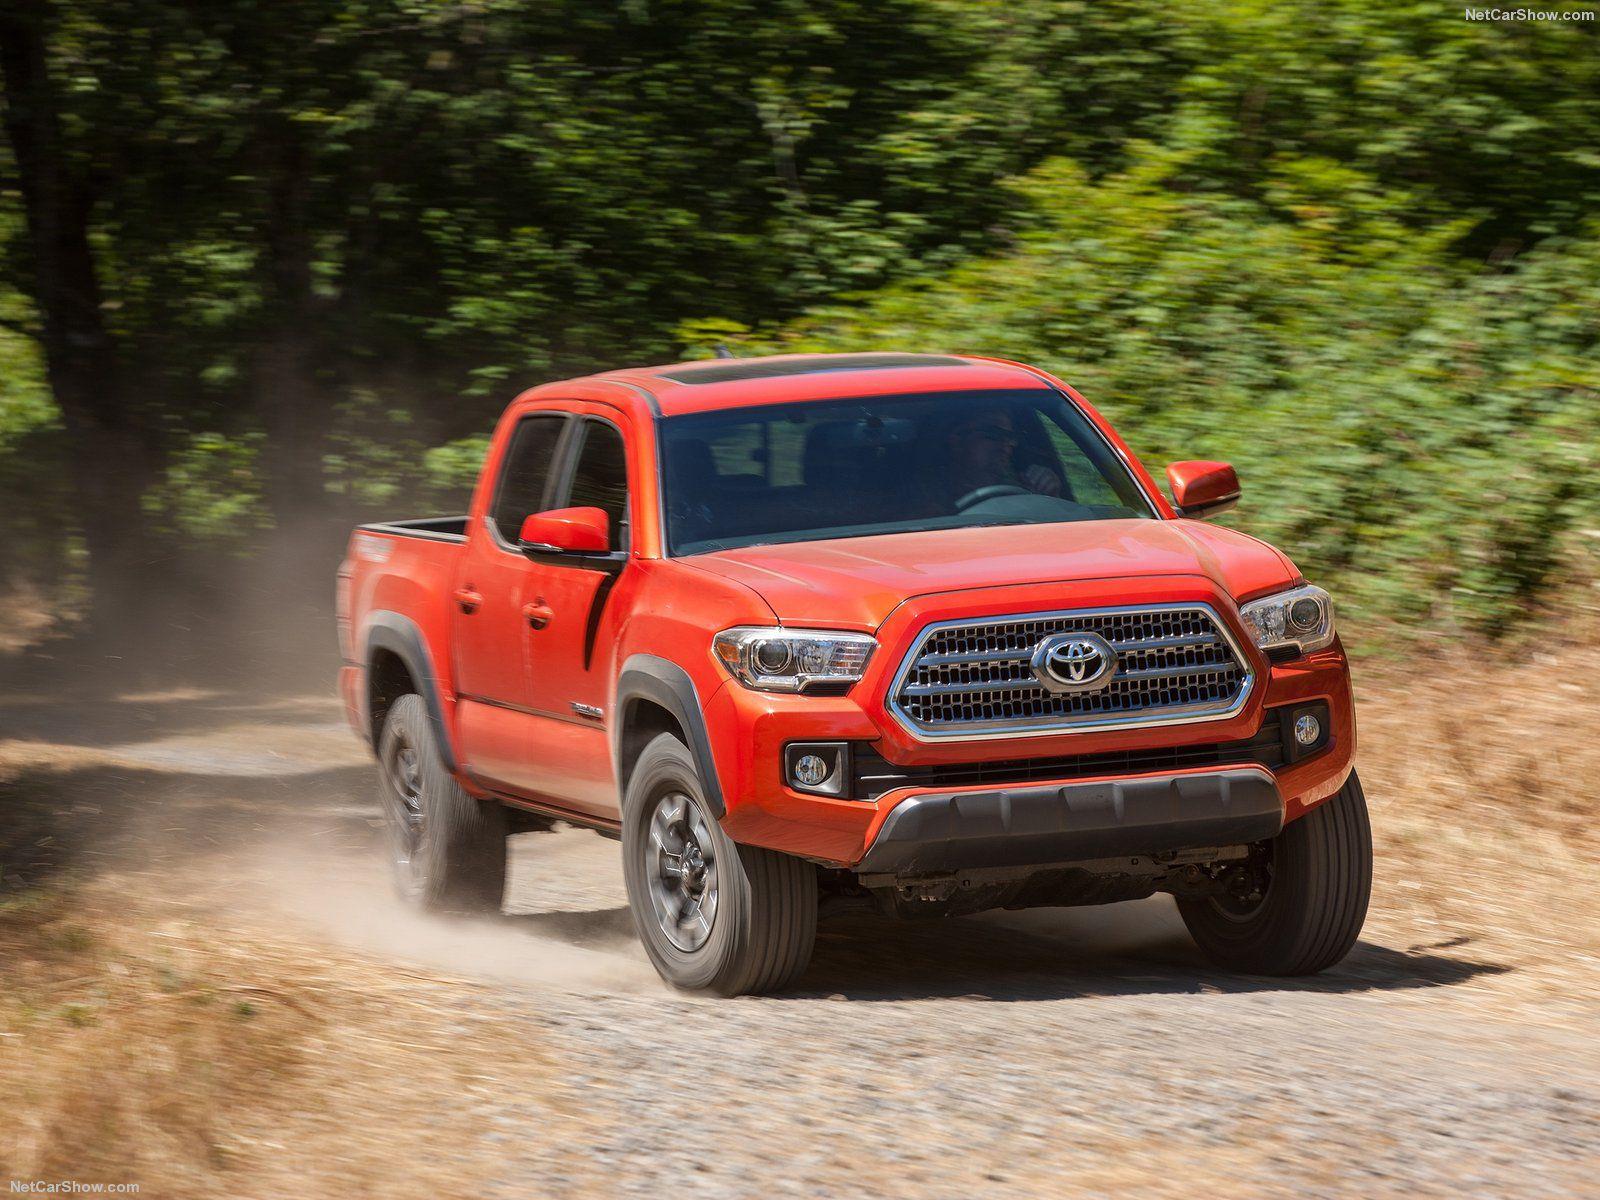 Nicaragua Auto Sales